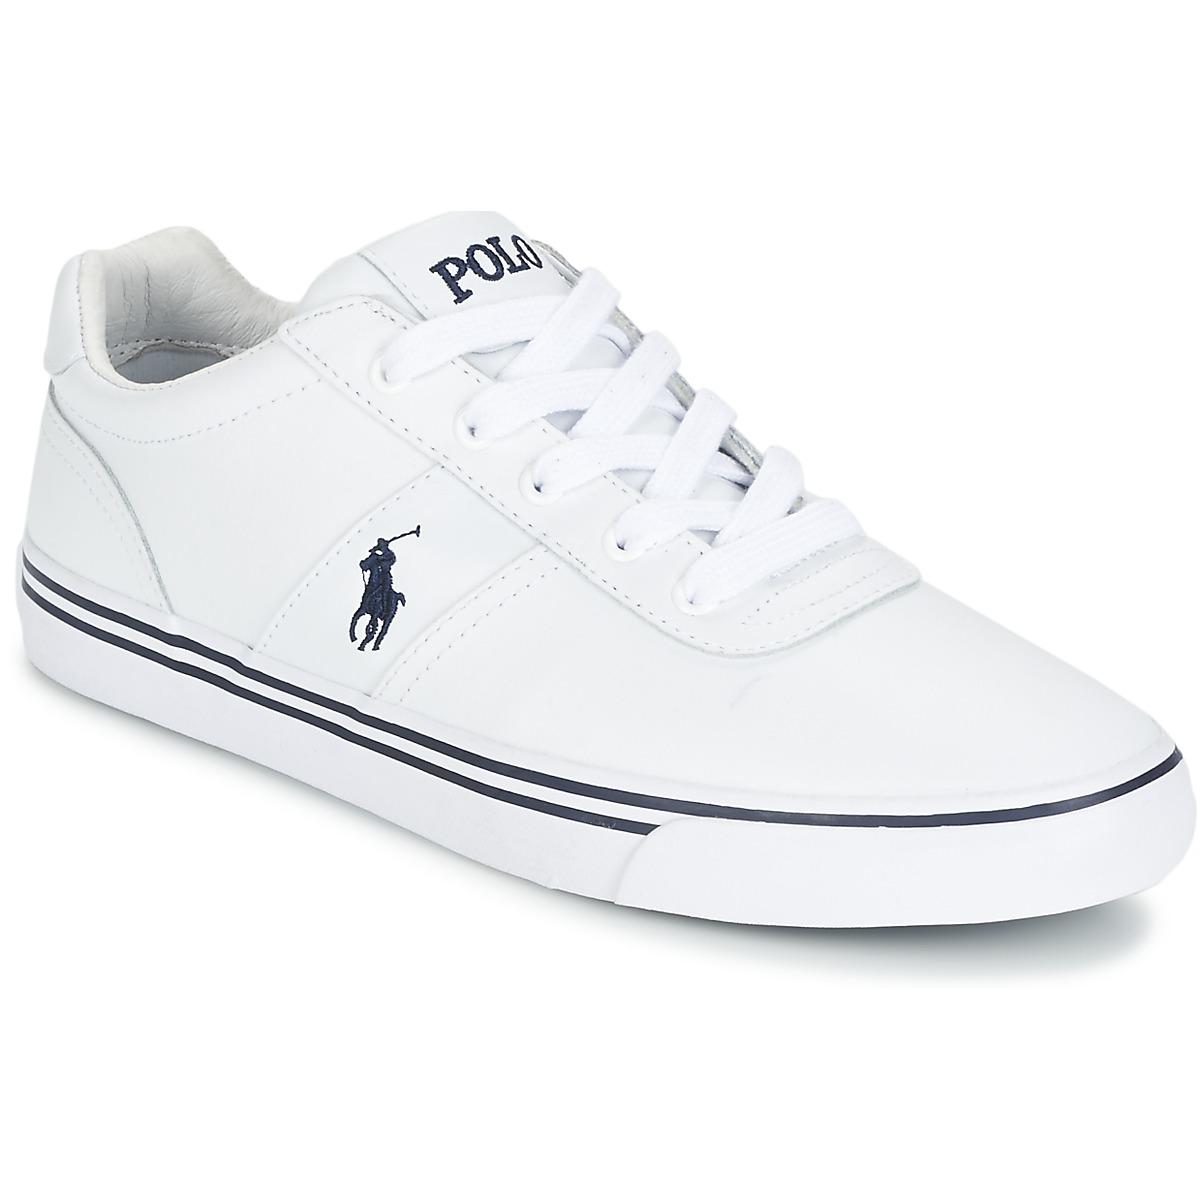 Polo Ralph Lauren HANFORD White - Fast